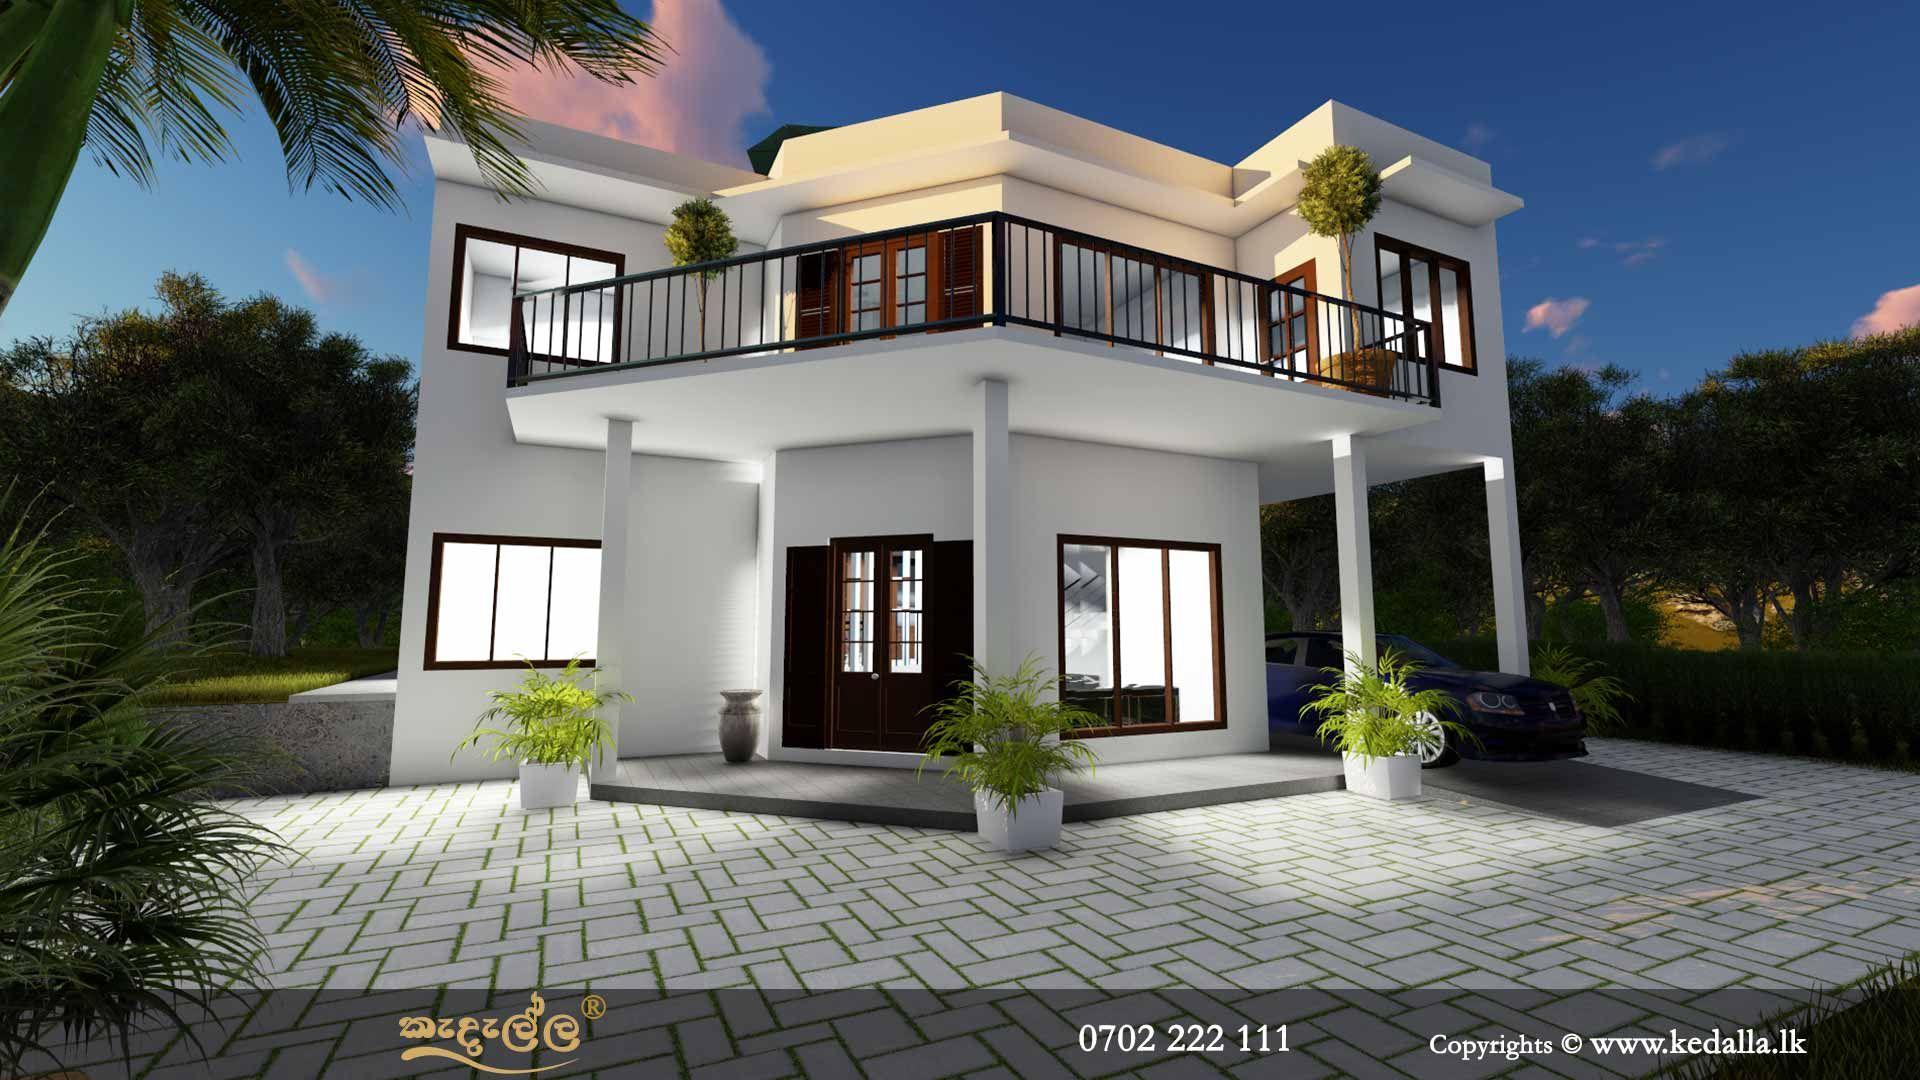 Modern Architectural House Plans In Sri Lanka Photos Kedella Home Decor Home Decor Ideas Home Decor Modern House Plans Architectural House Plans House Design